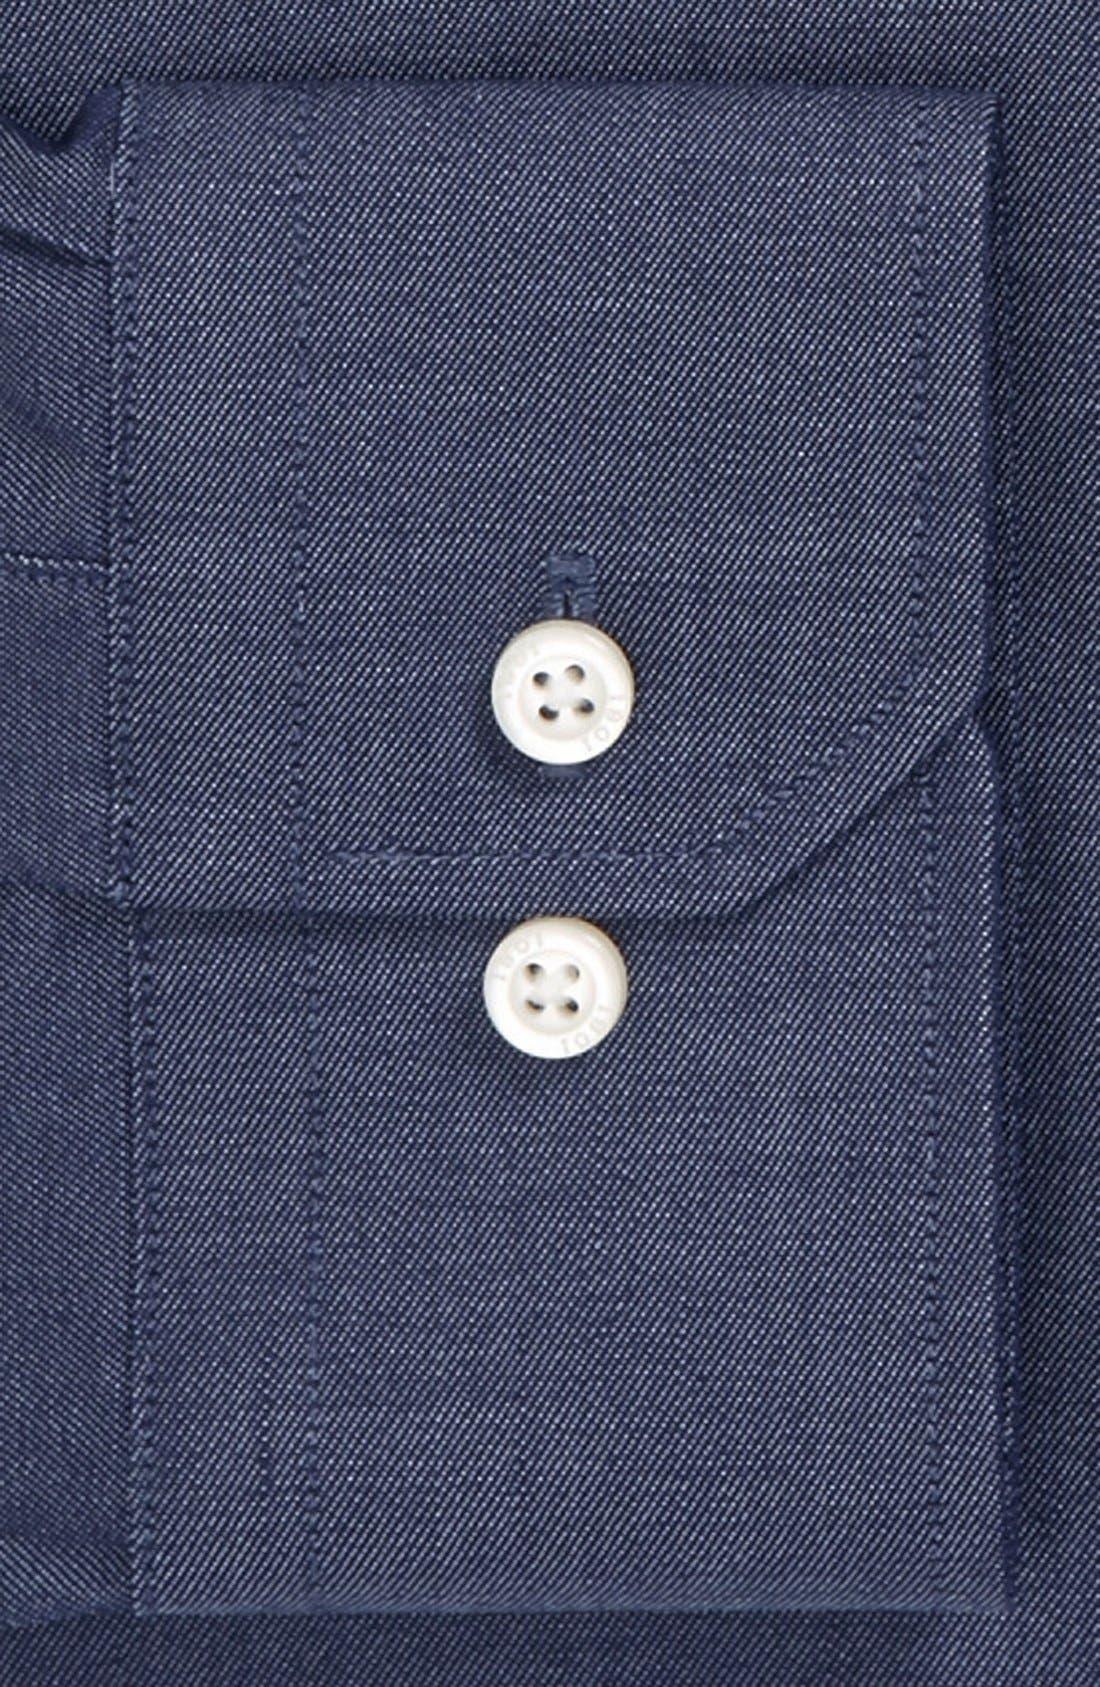 Alternate Image 2  - 1901 Trim Fit Denim Dress Shirt